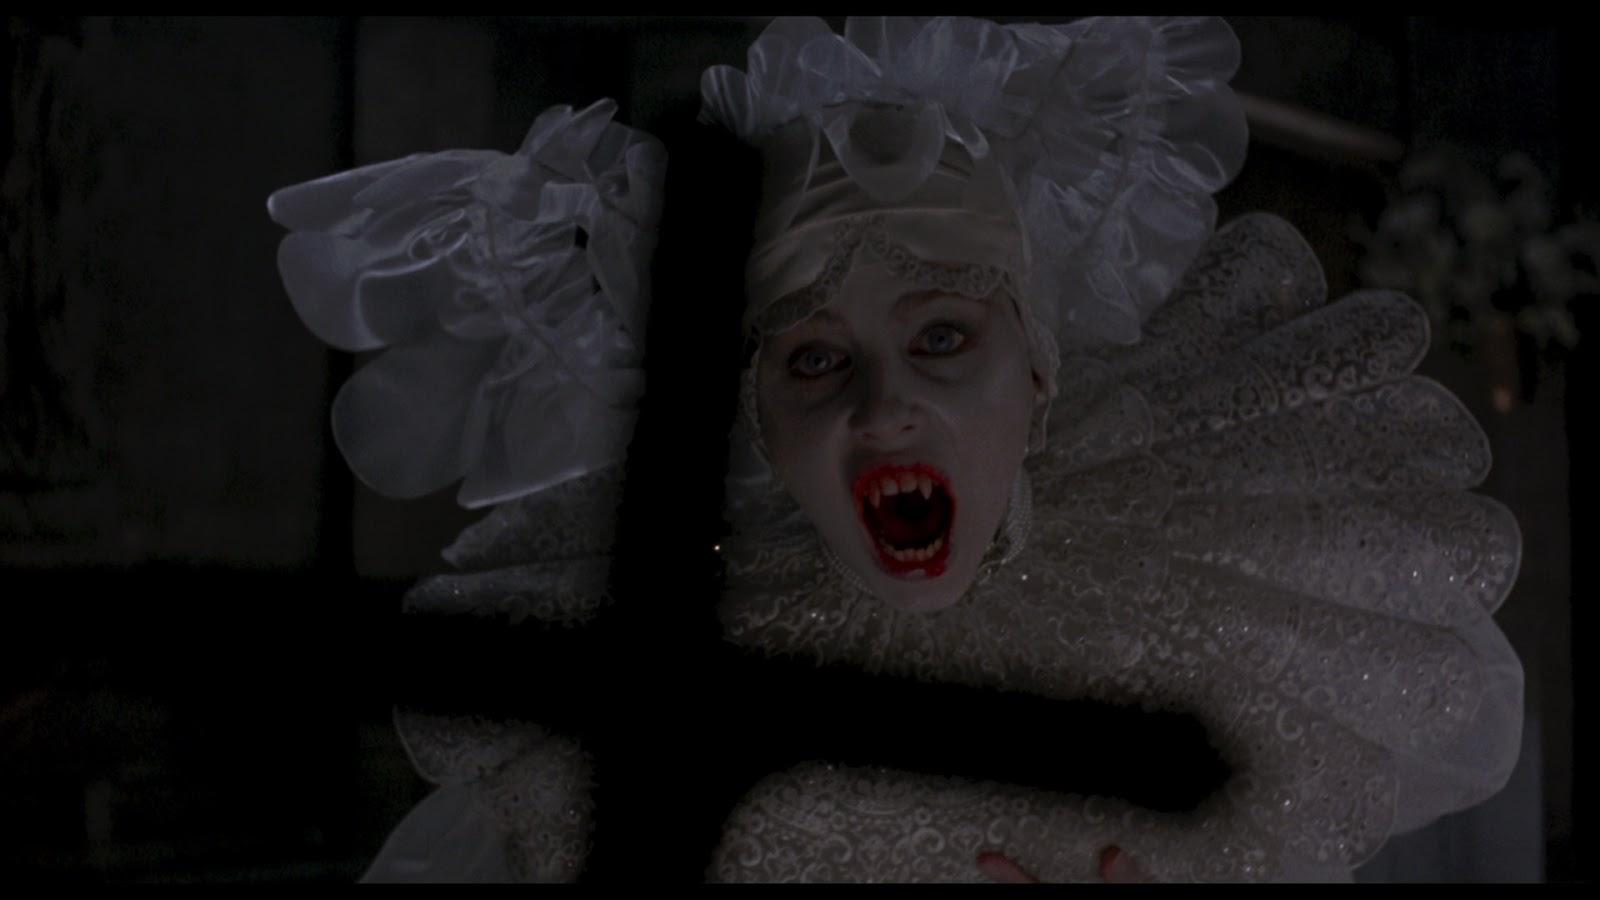 dracula like a vampire archangel